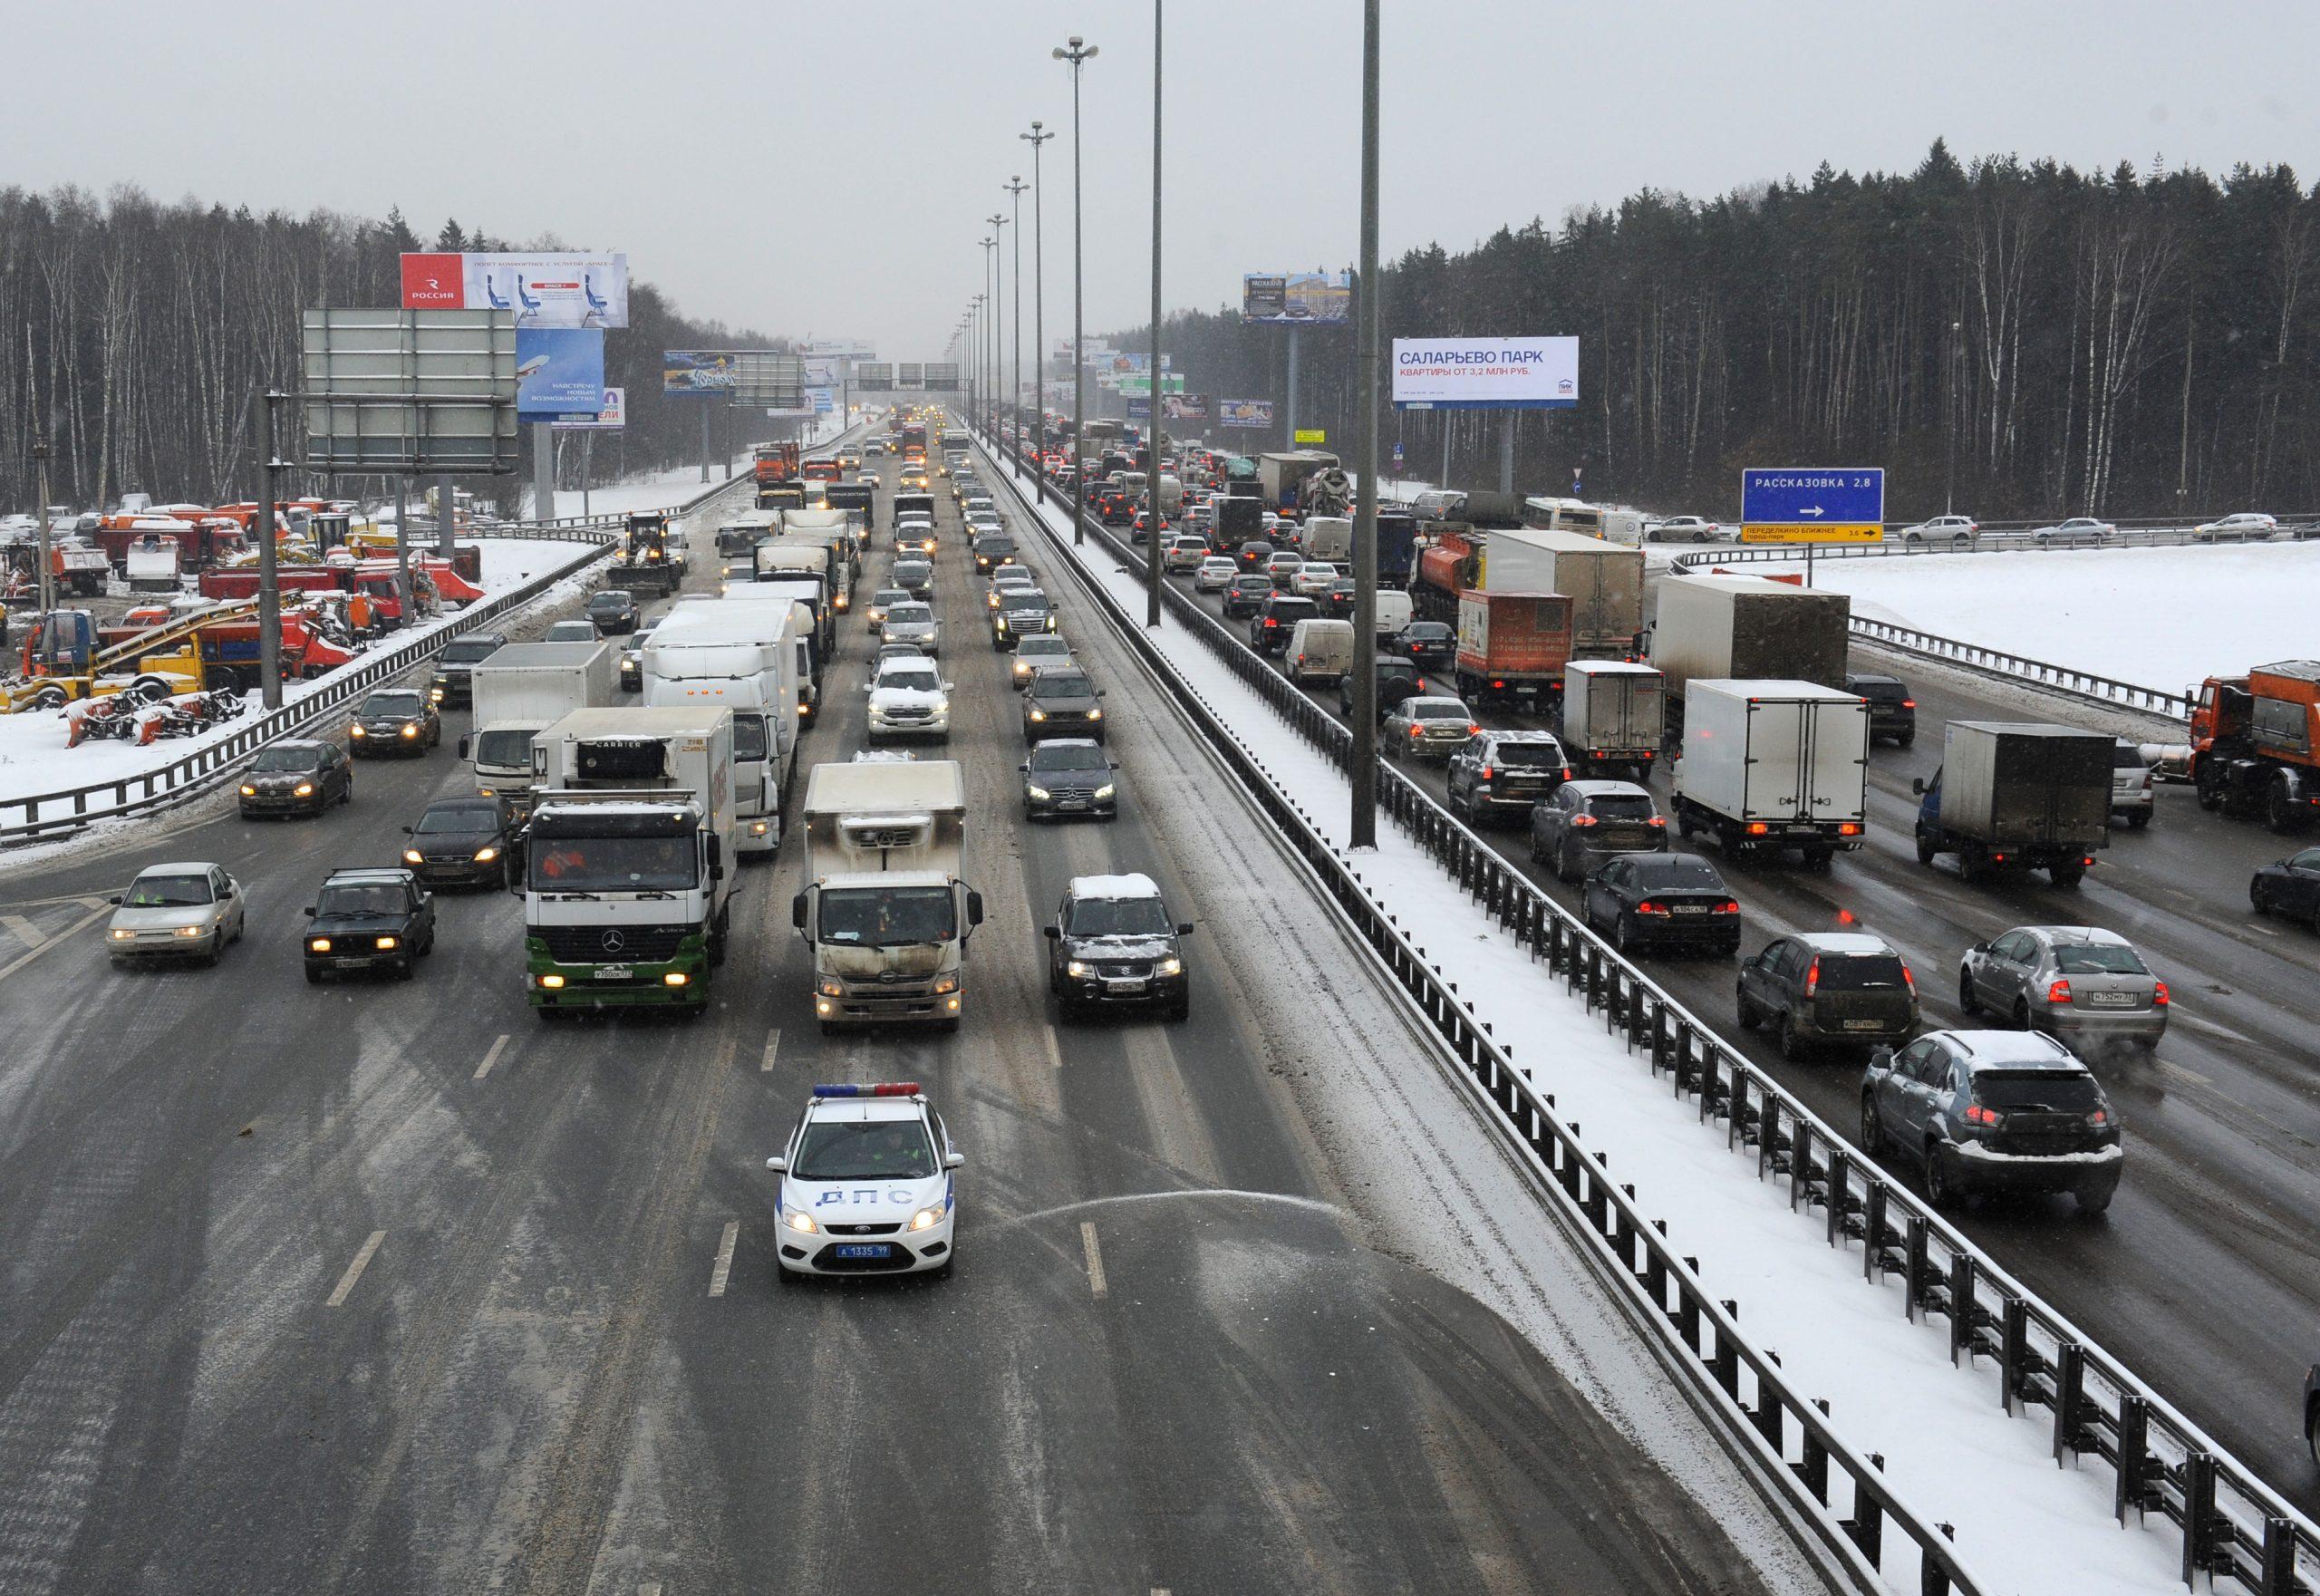 Заснеженные дороги требуют внимания. Фото: Александр Кожохин «Вечерняя Москва»